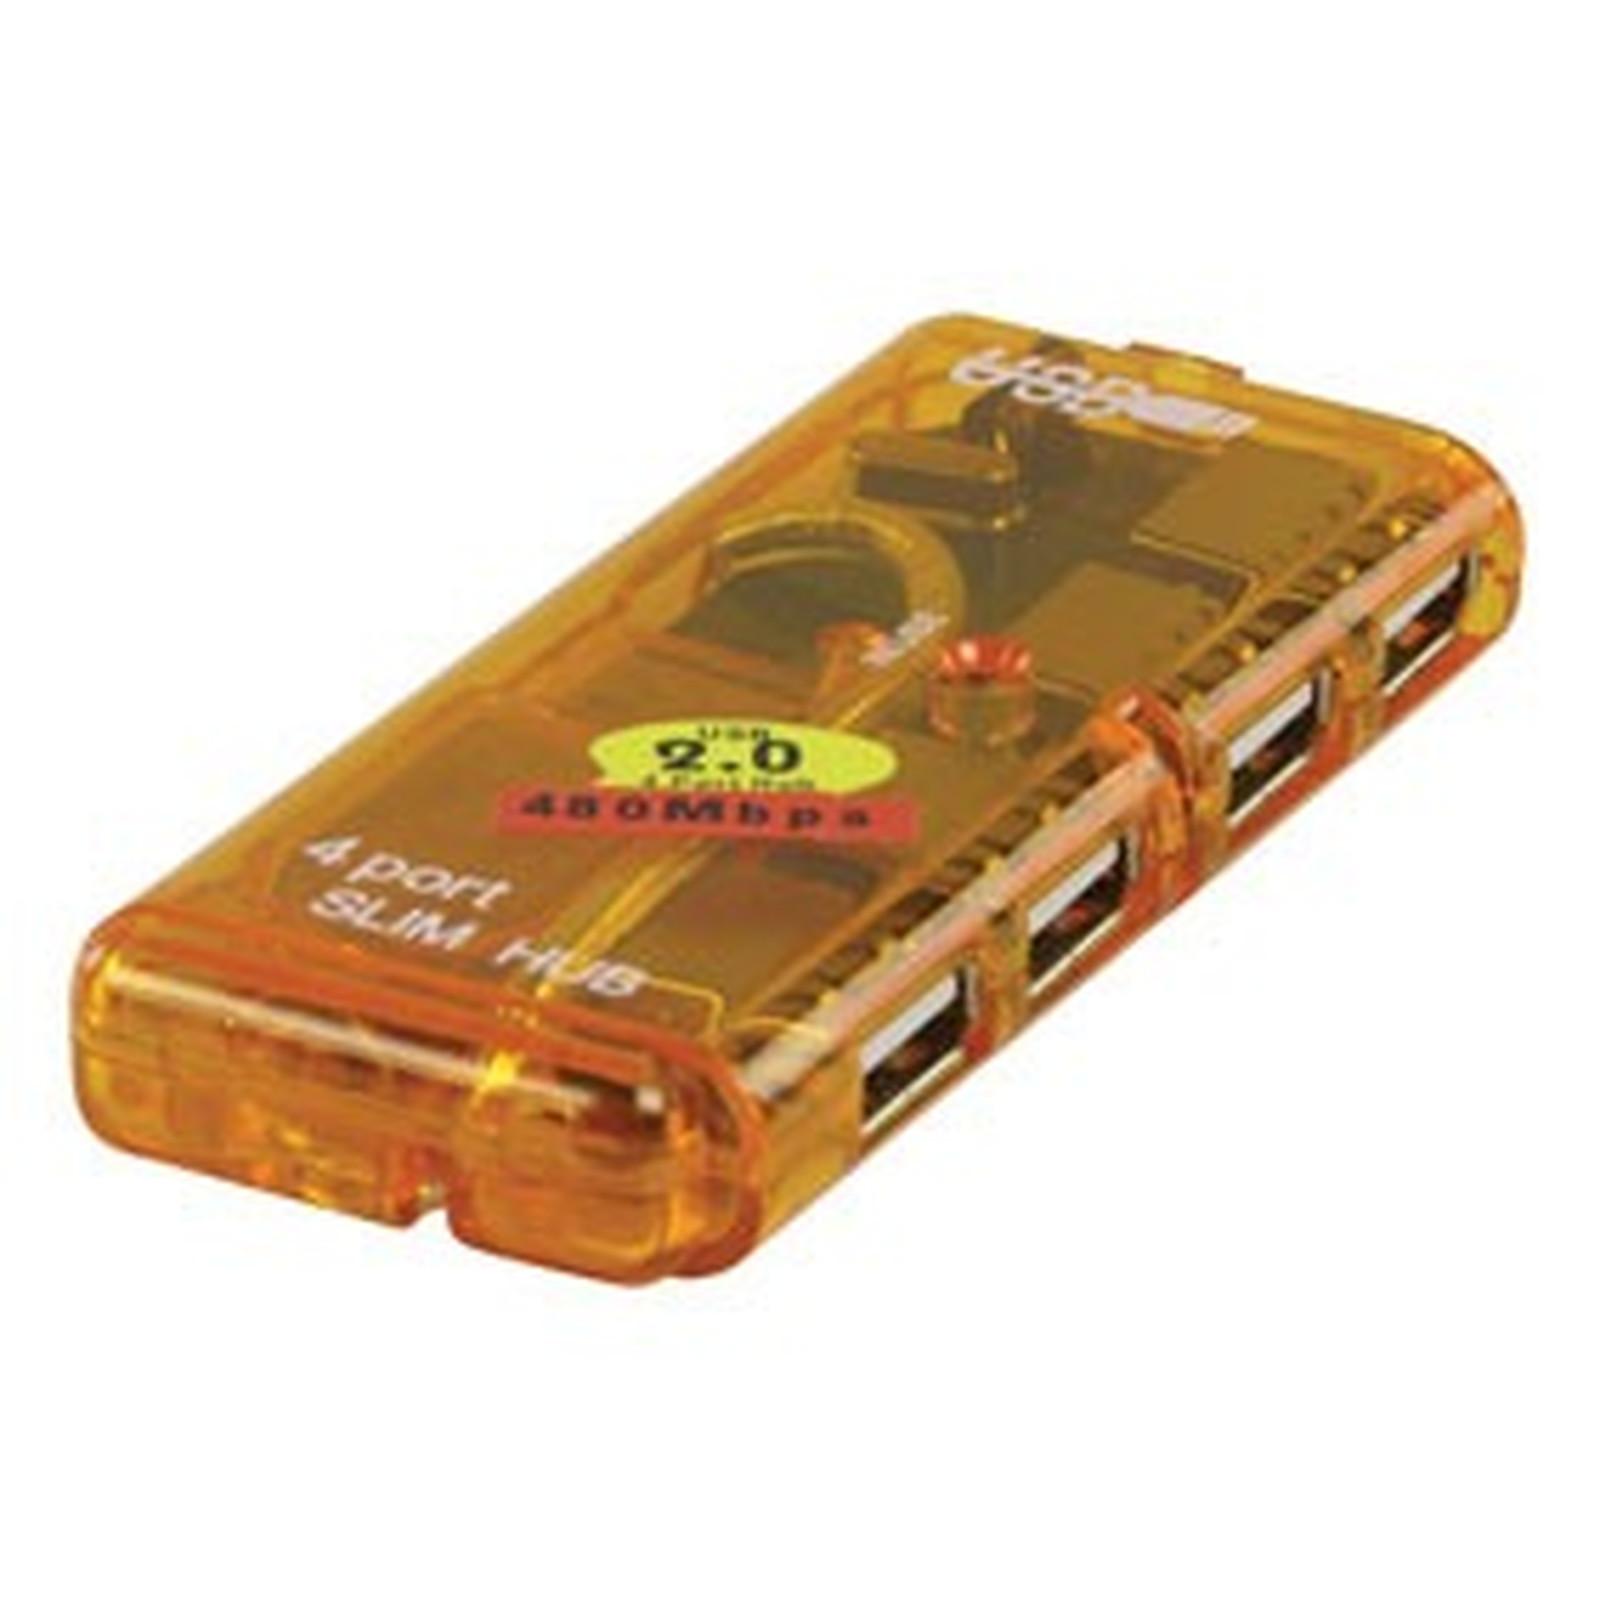 Hub USB 2.0 compact (4 ports) - (coloris jaune)